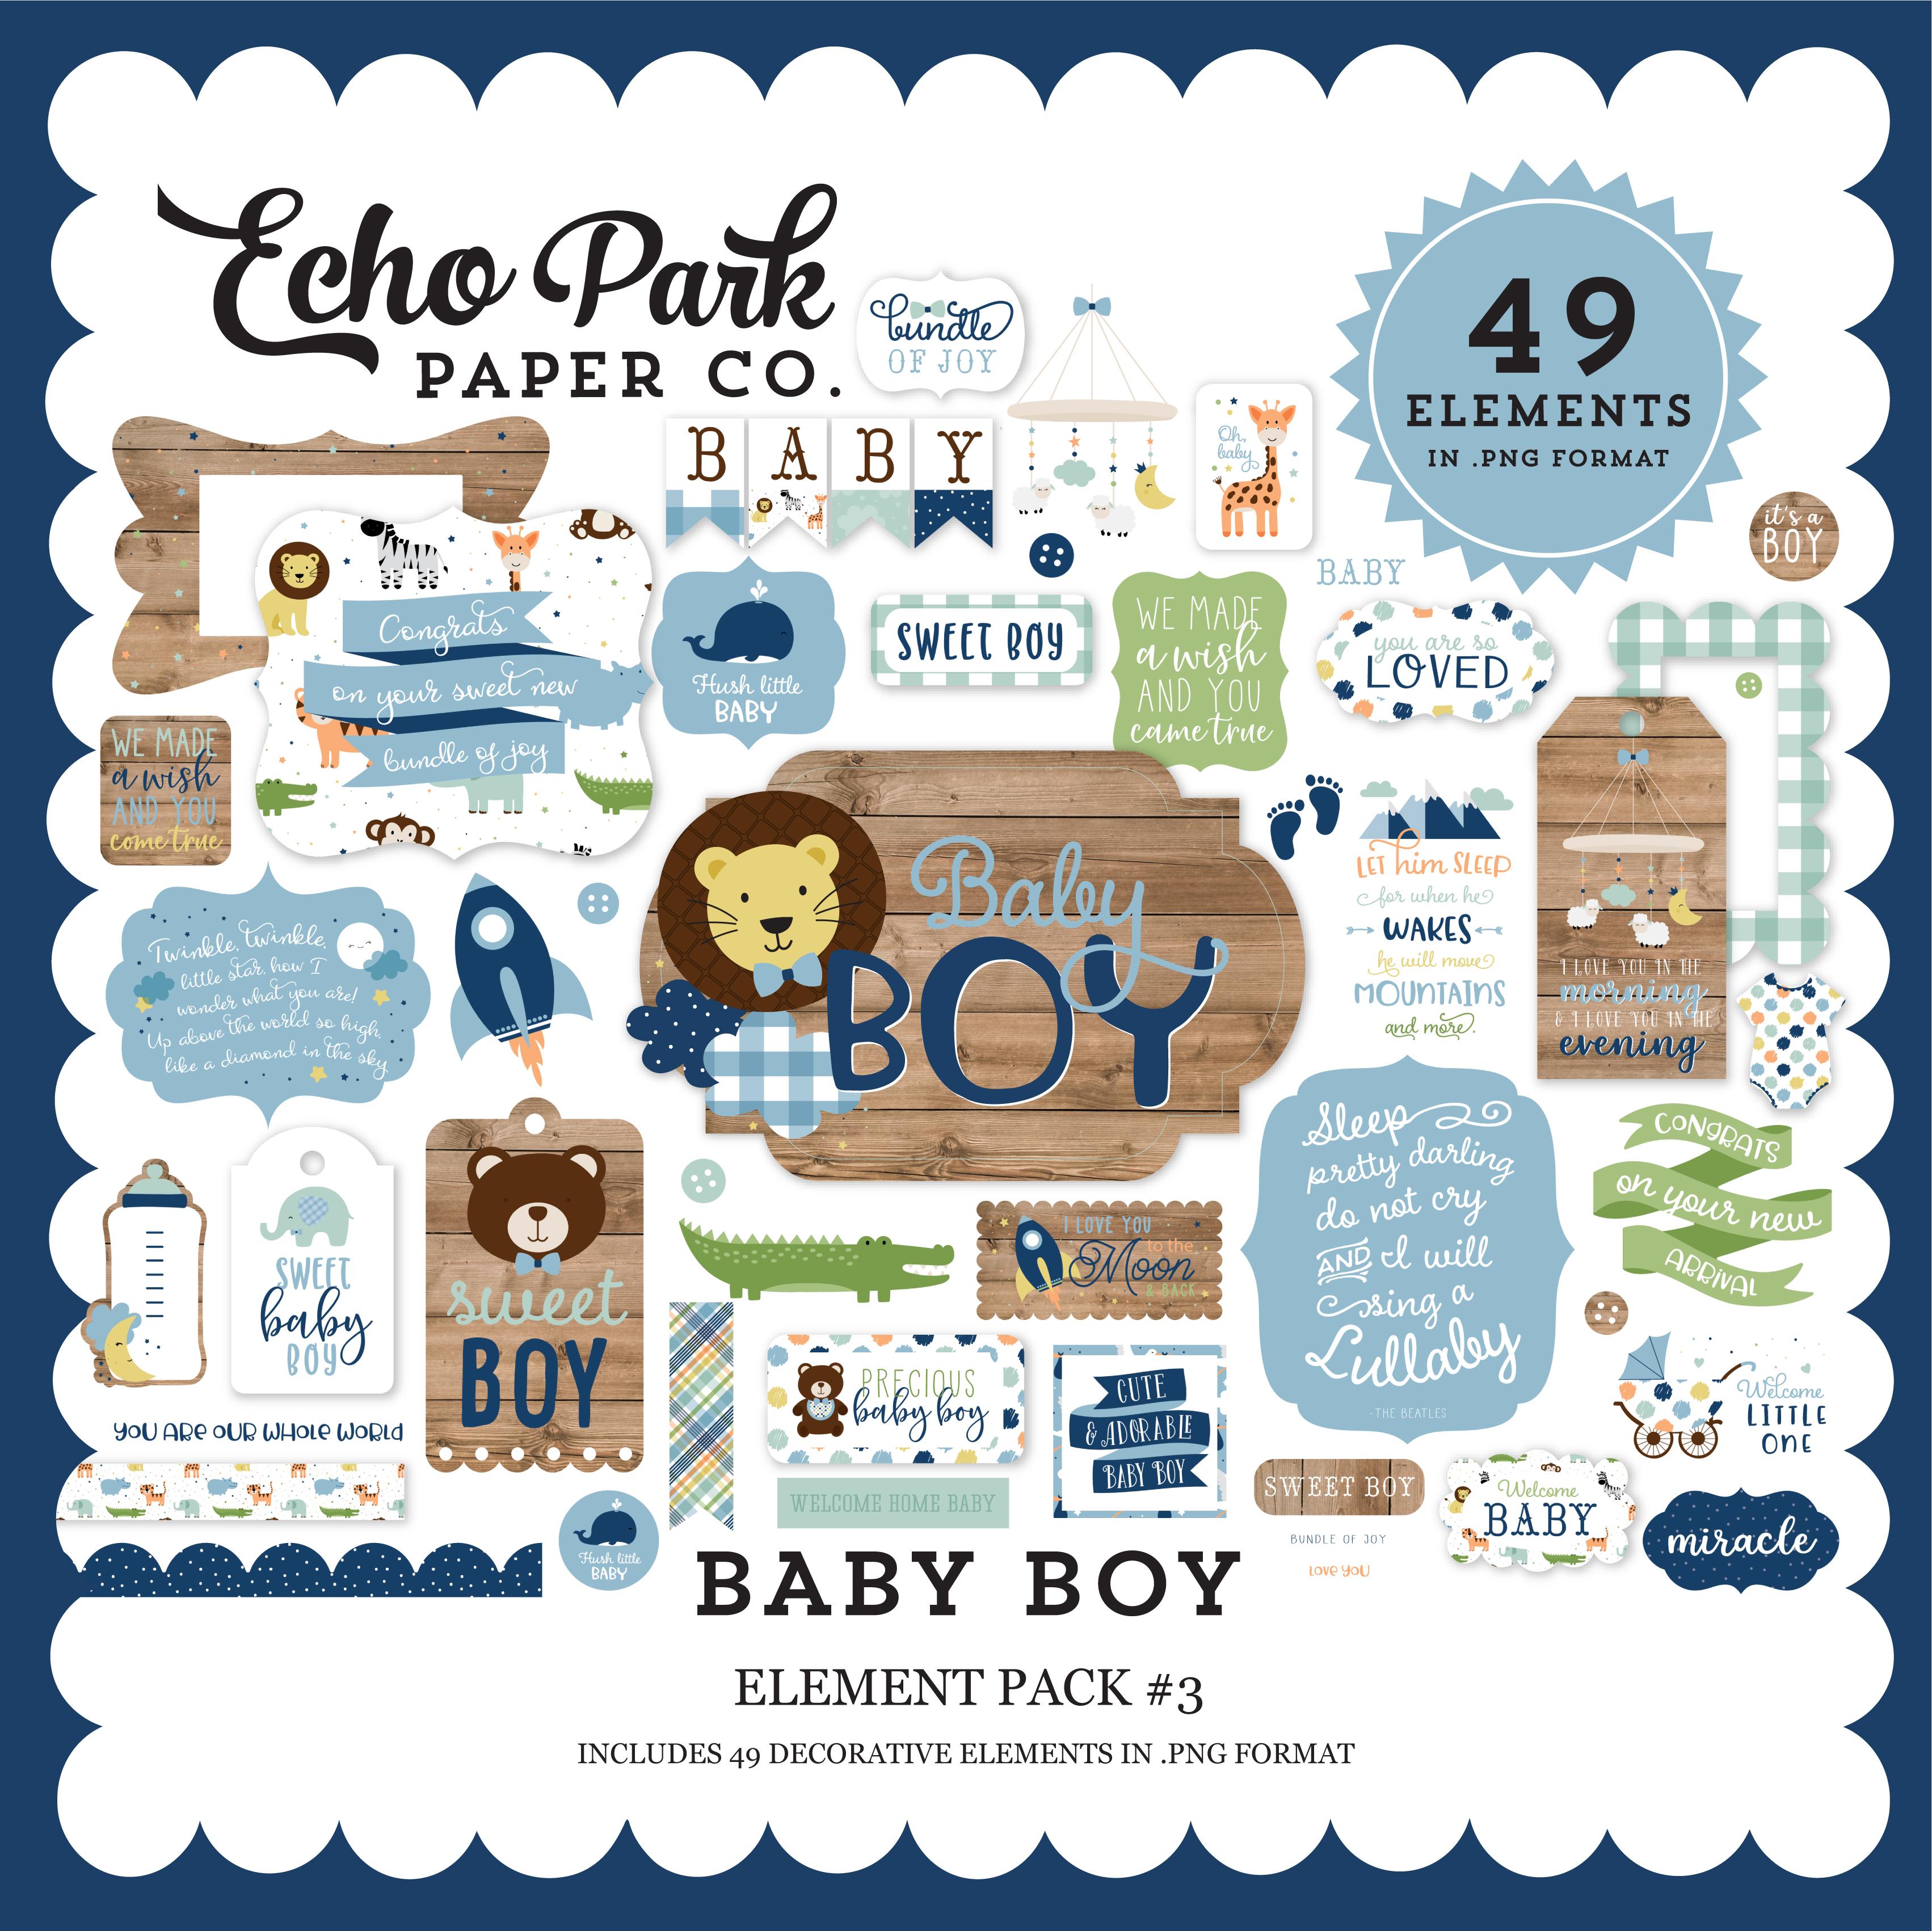 Baby Boy Element Pack #3